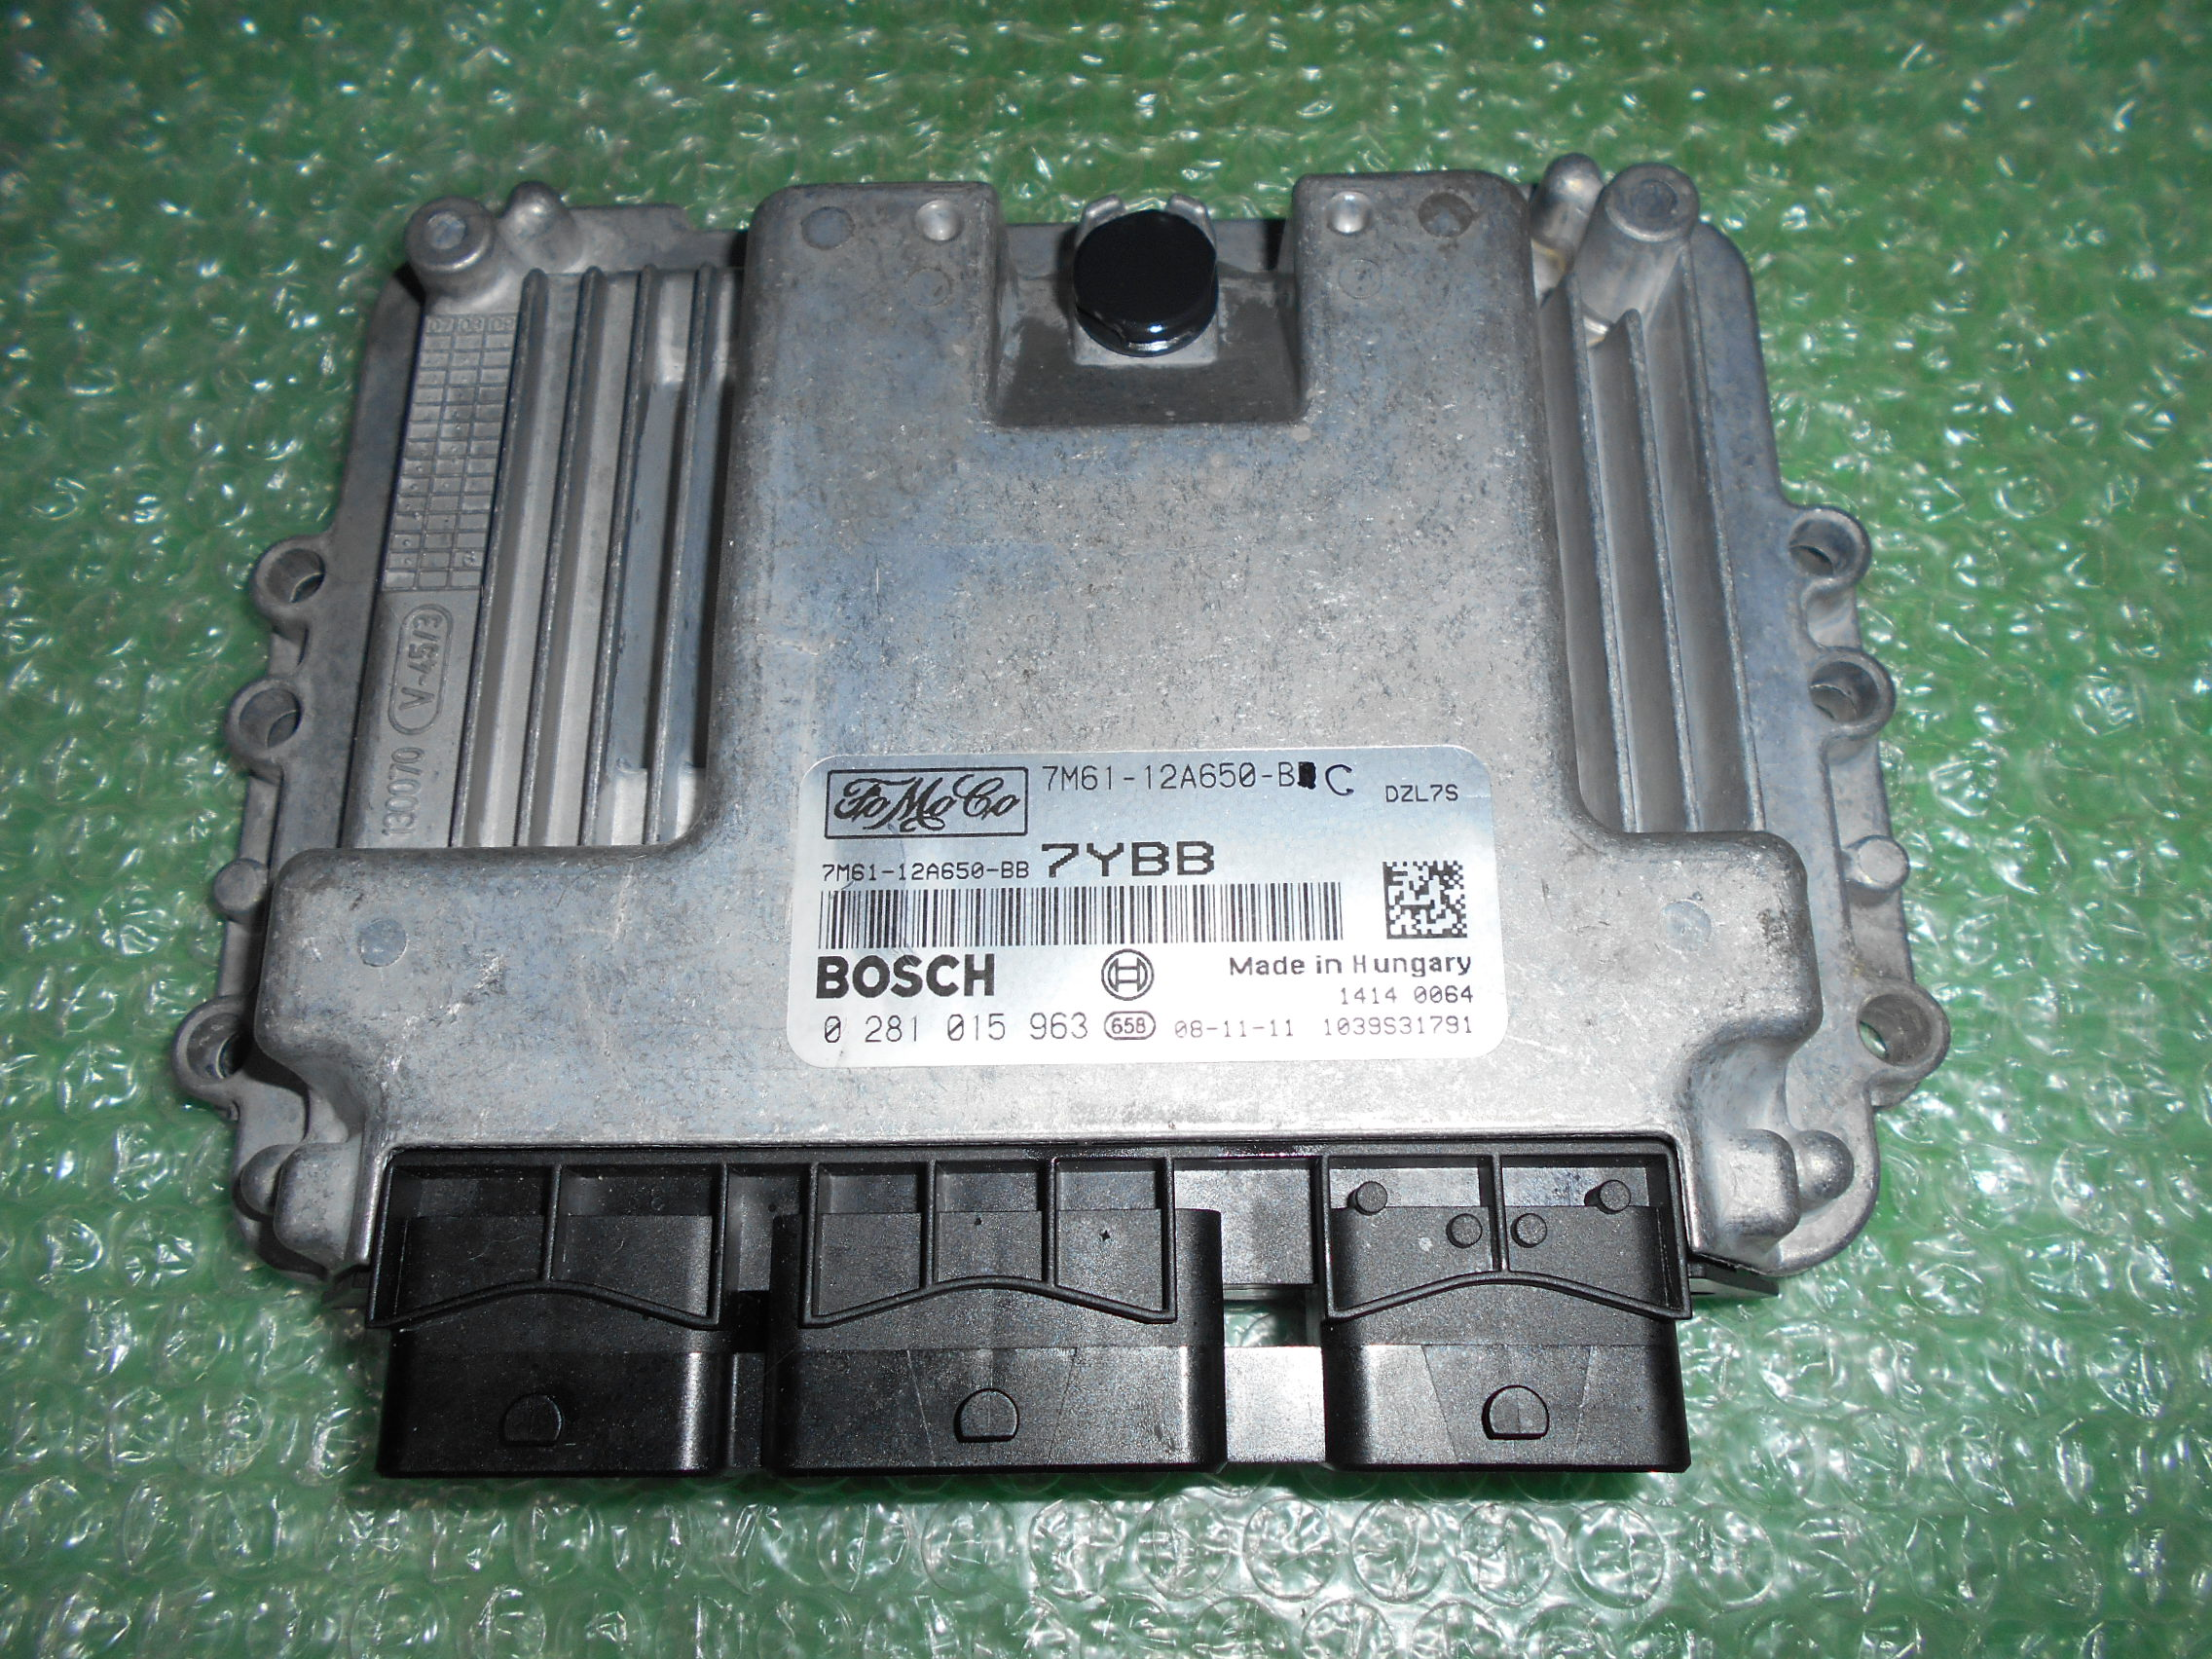 CENTRALITA UCE MOTOR 7M61-12A650-BC – BOSCH 0281015963 FORD FOCUS II – MAZDA 3 1.6 TDCI (2003-2008)